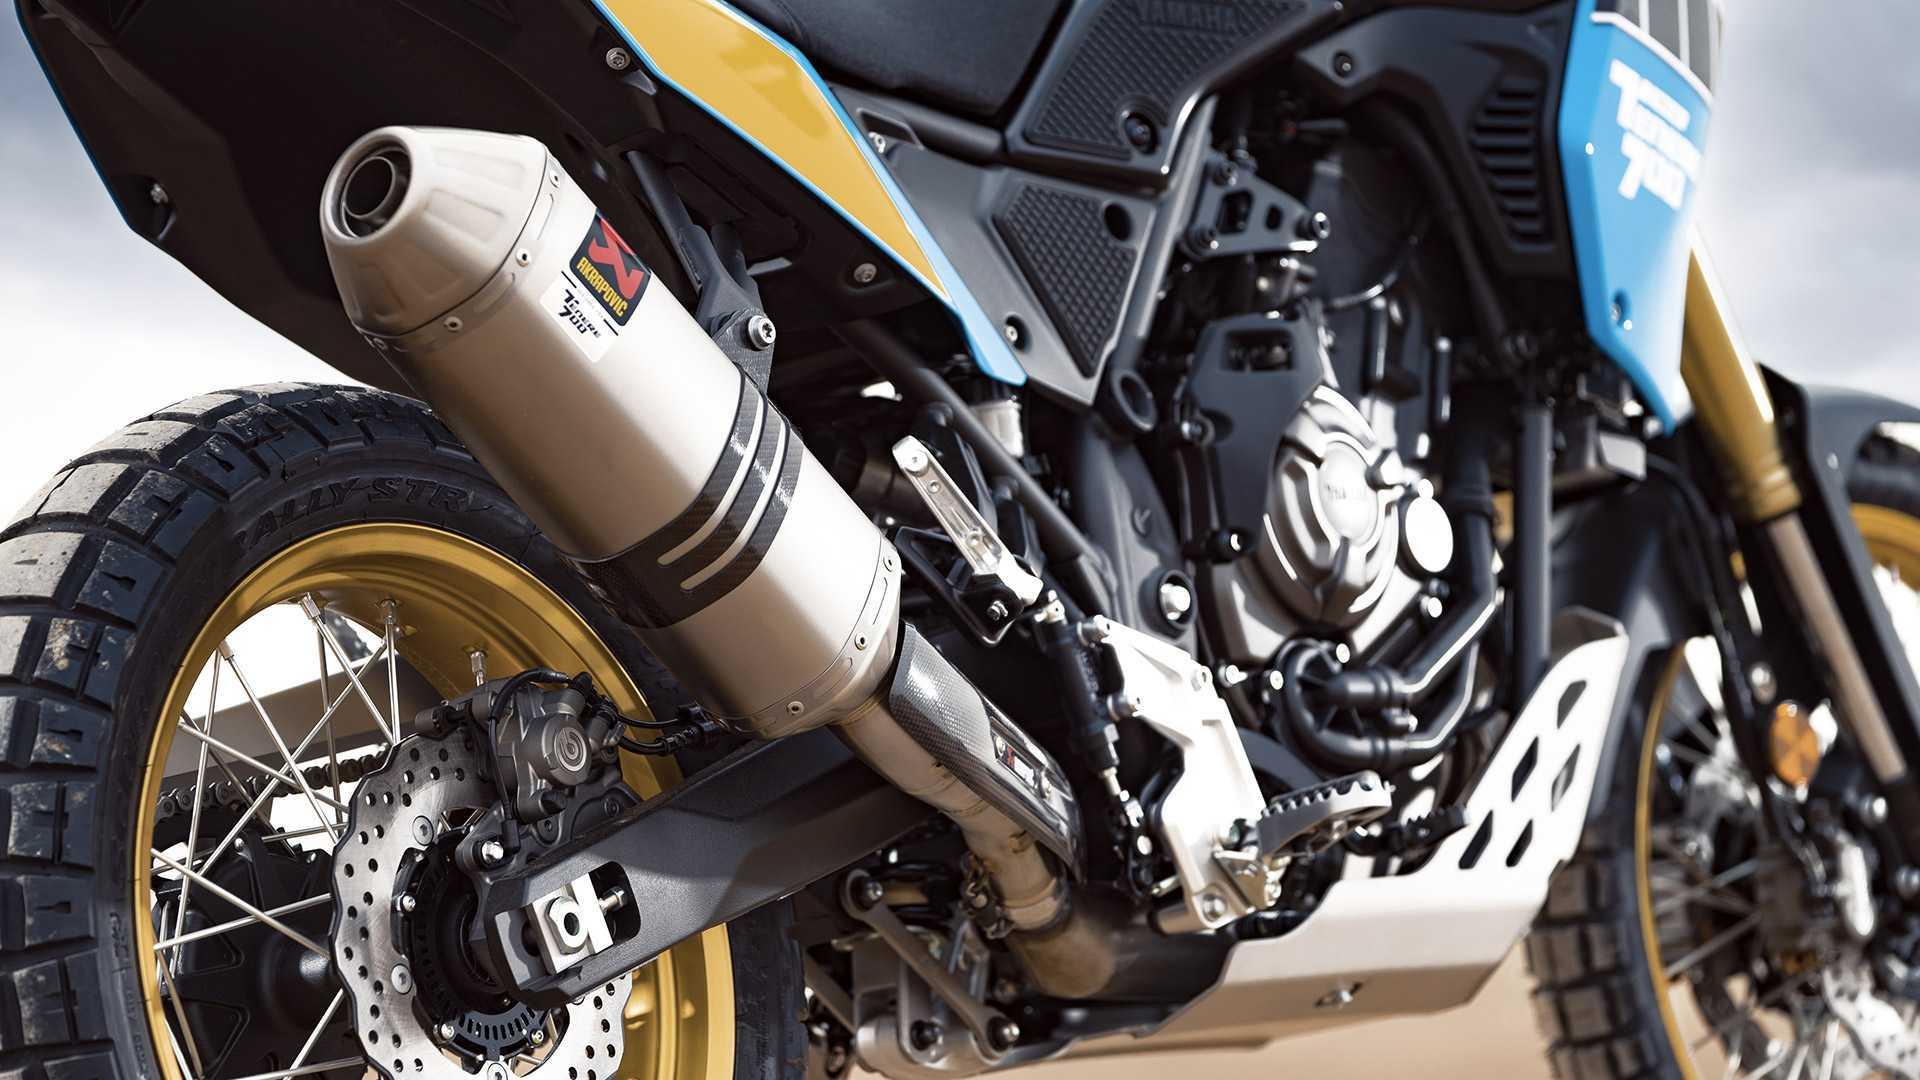 New 2020 Yamaha Ténéré 700 Rally Edition Celebrates Dakar Heritage